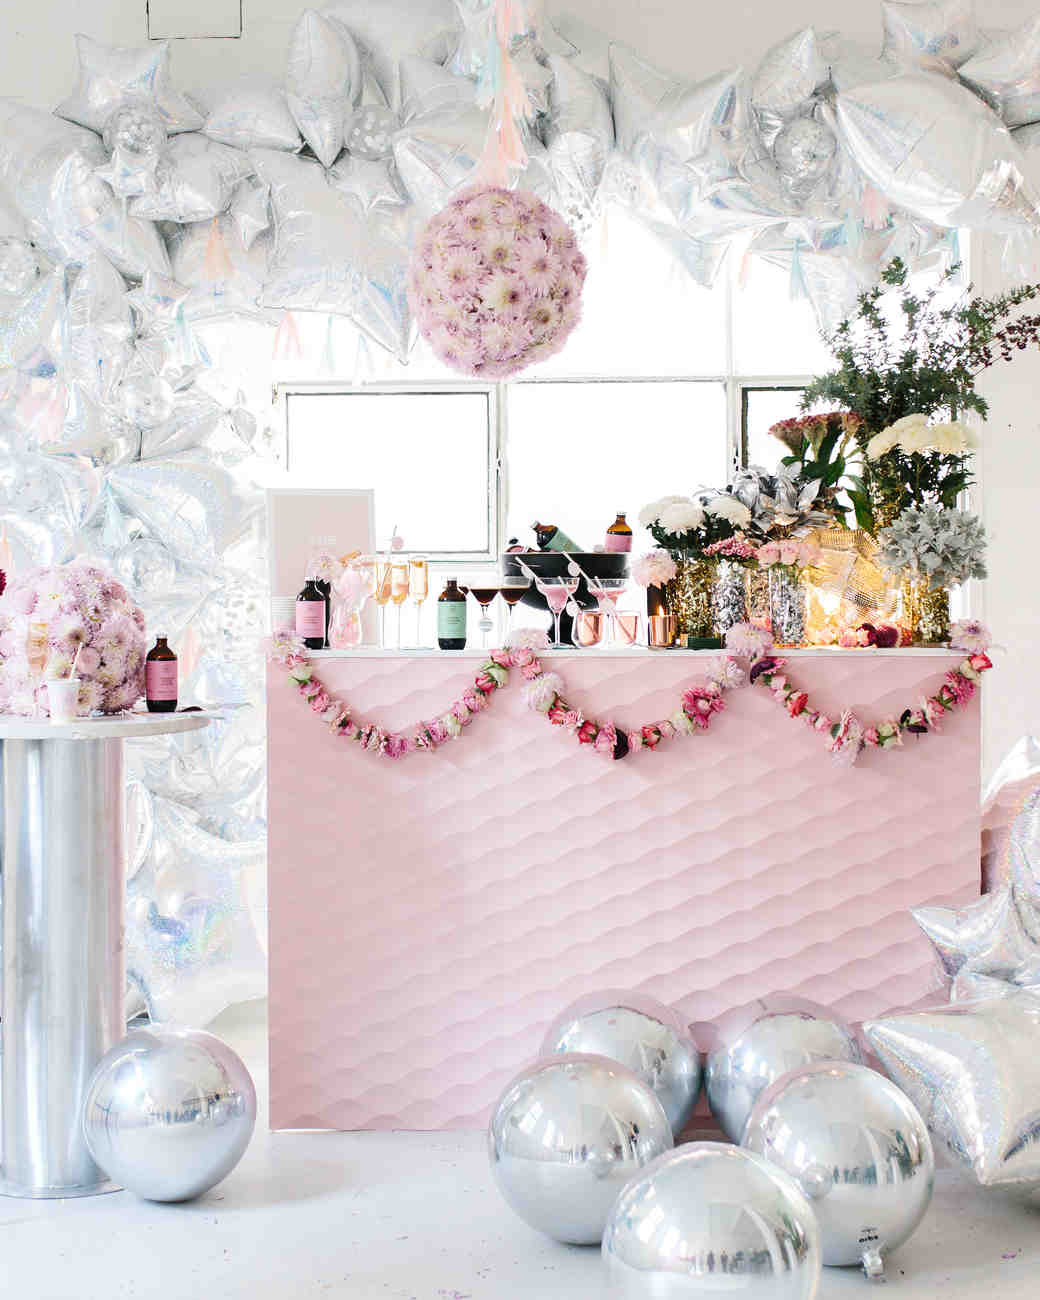 Creative Bachelorette Party Decoration Ideas | Martha Stewart Weddings